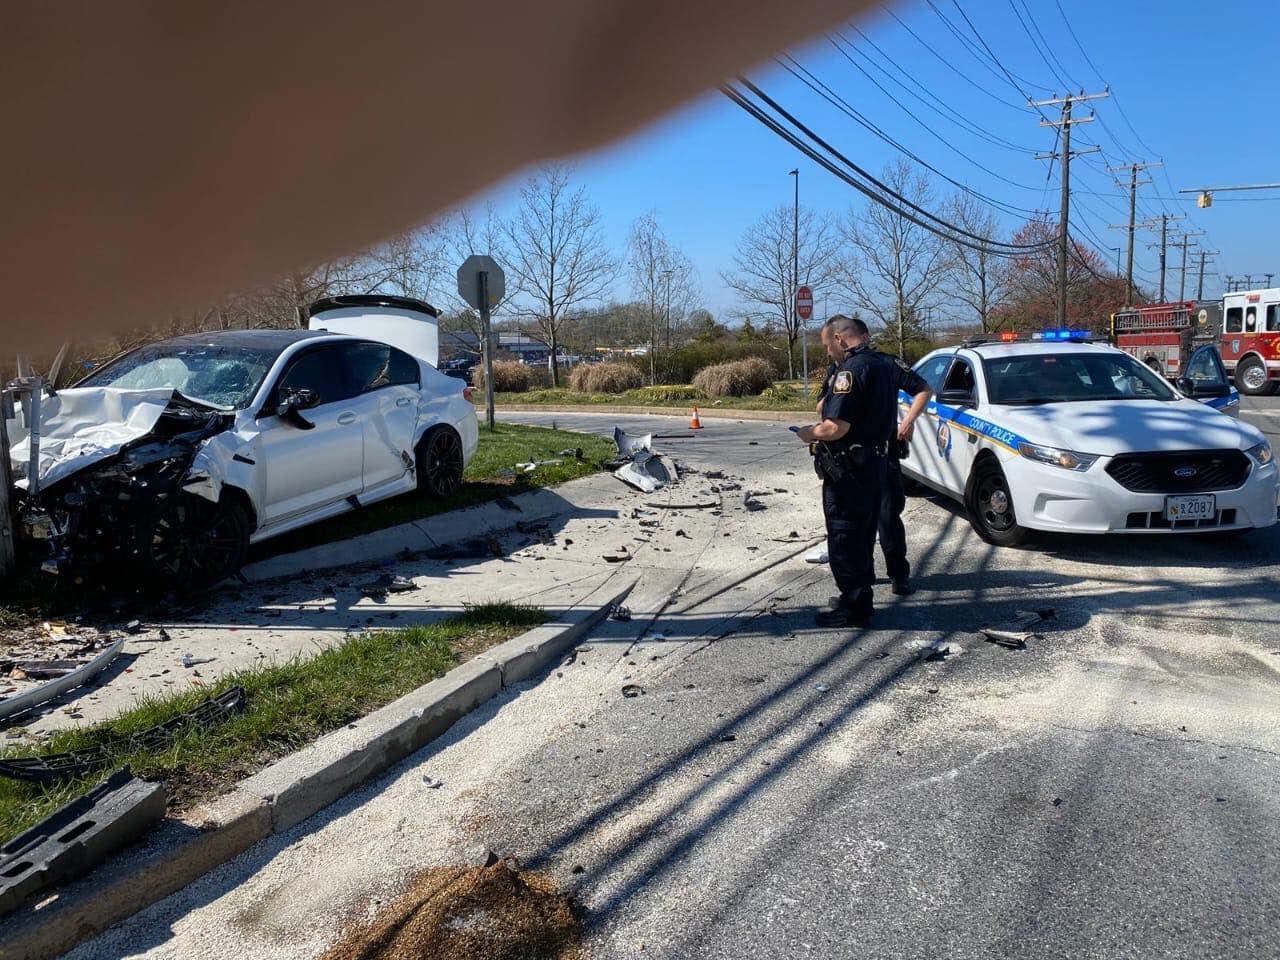 BMW_M5_accident_0001